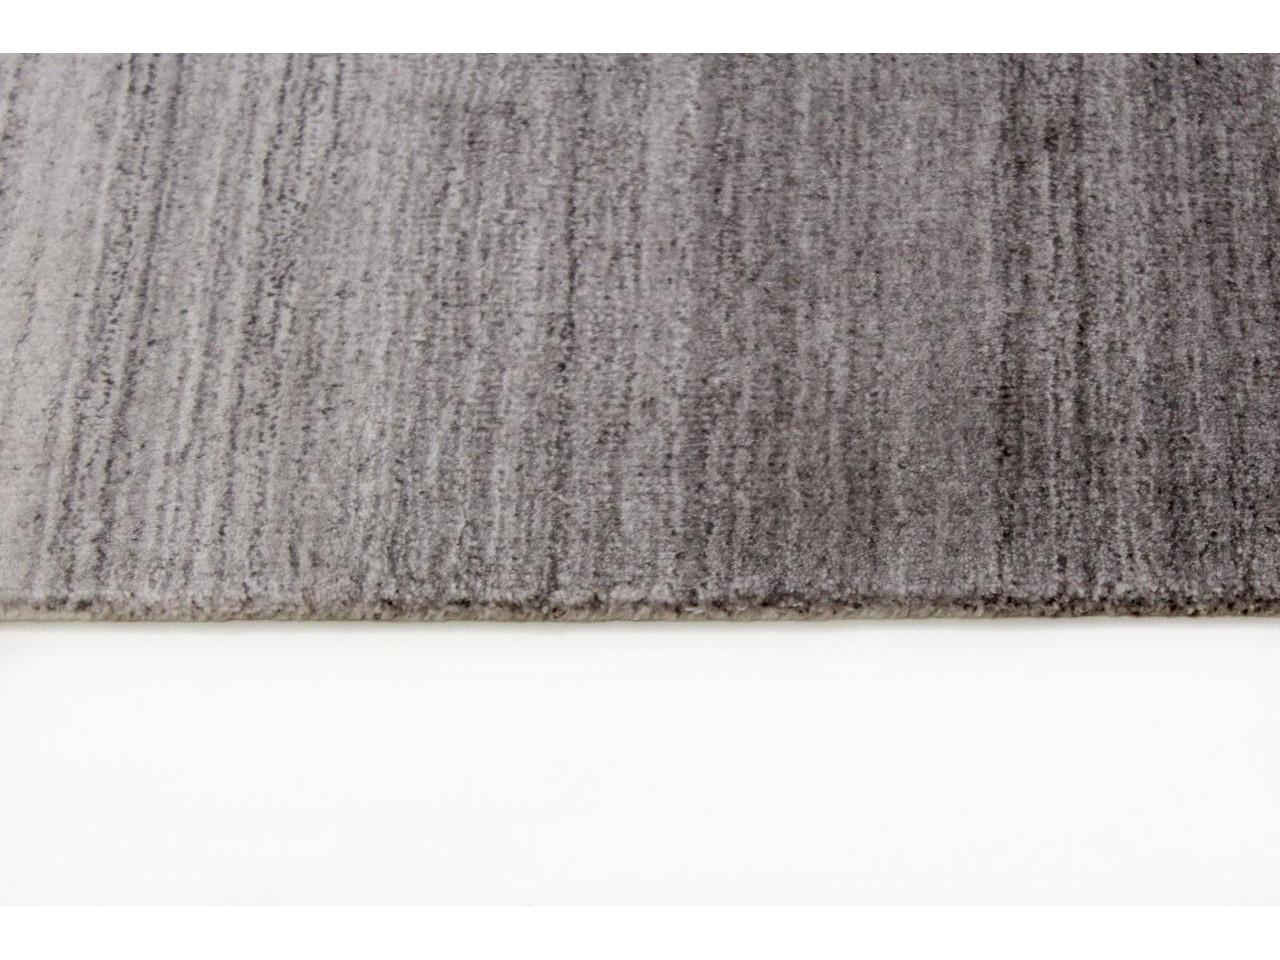 Arc de sant brown tapis unis n 34329 200x140cm - Tapis 200x140 ...